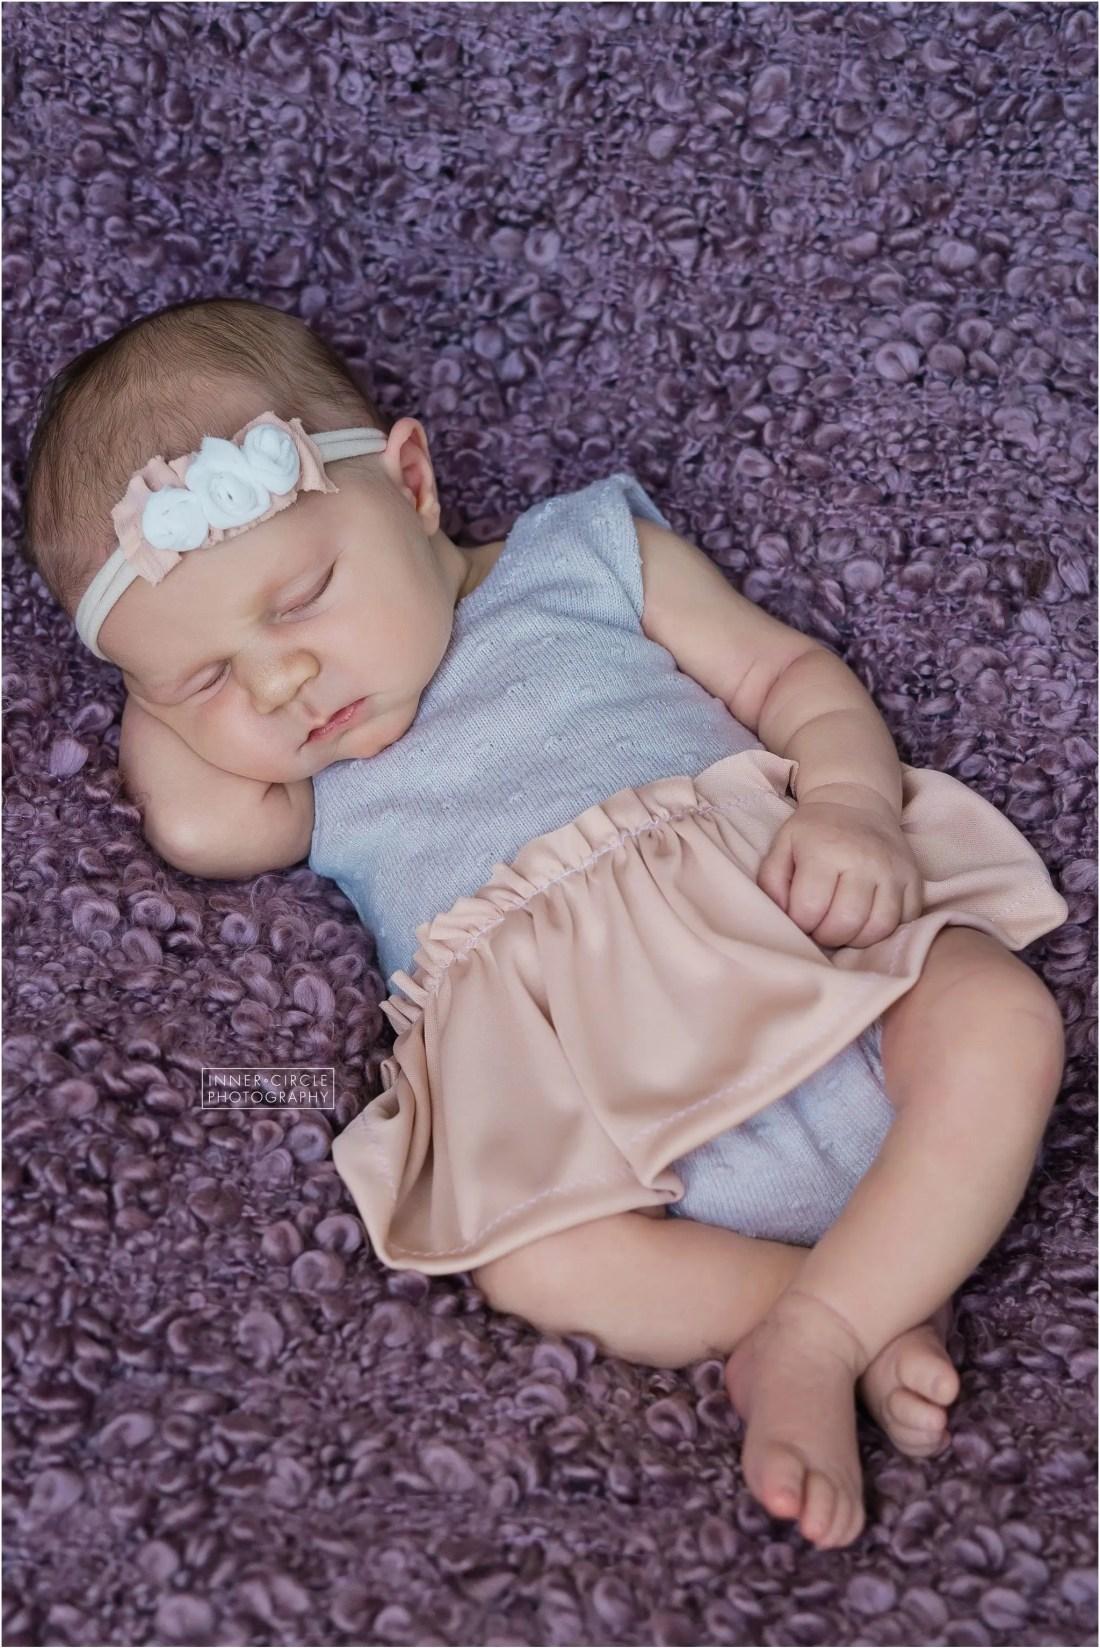 SarahMartin_Newborn_InnerCirclePhoto_002 Maternity - Newborn  Michigan Photography